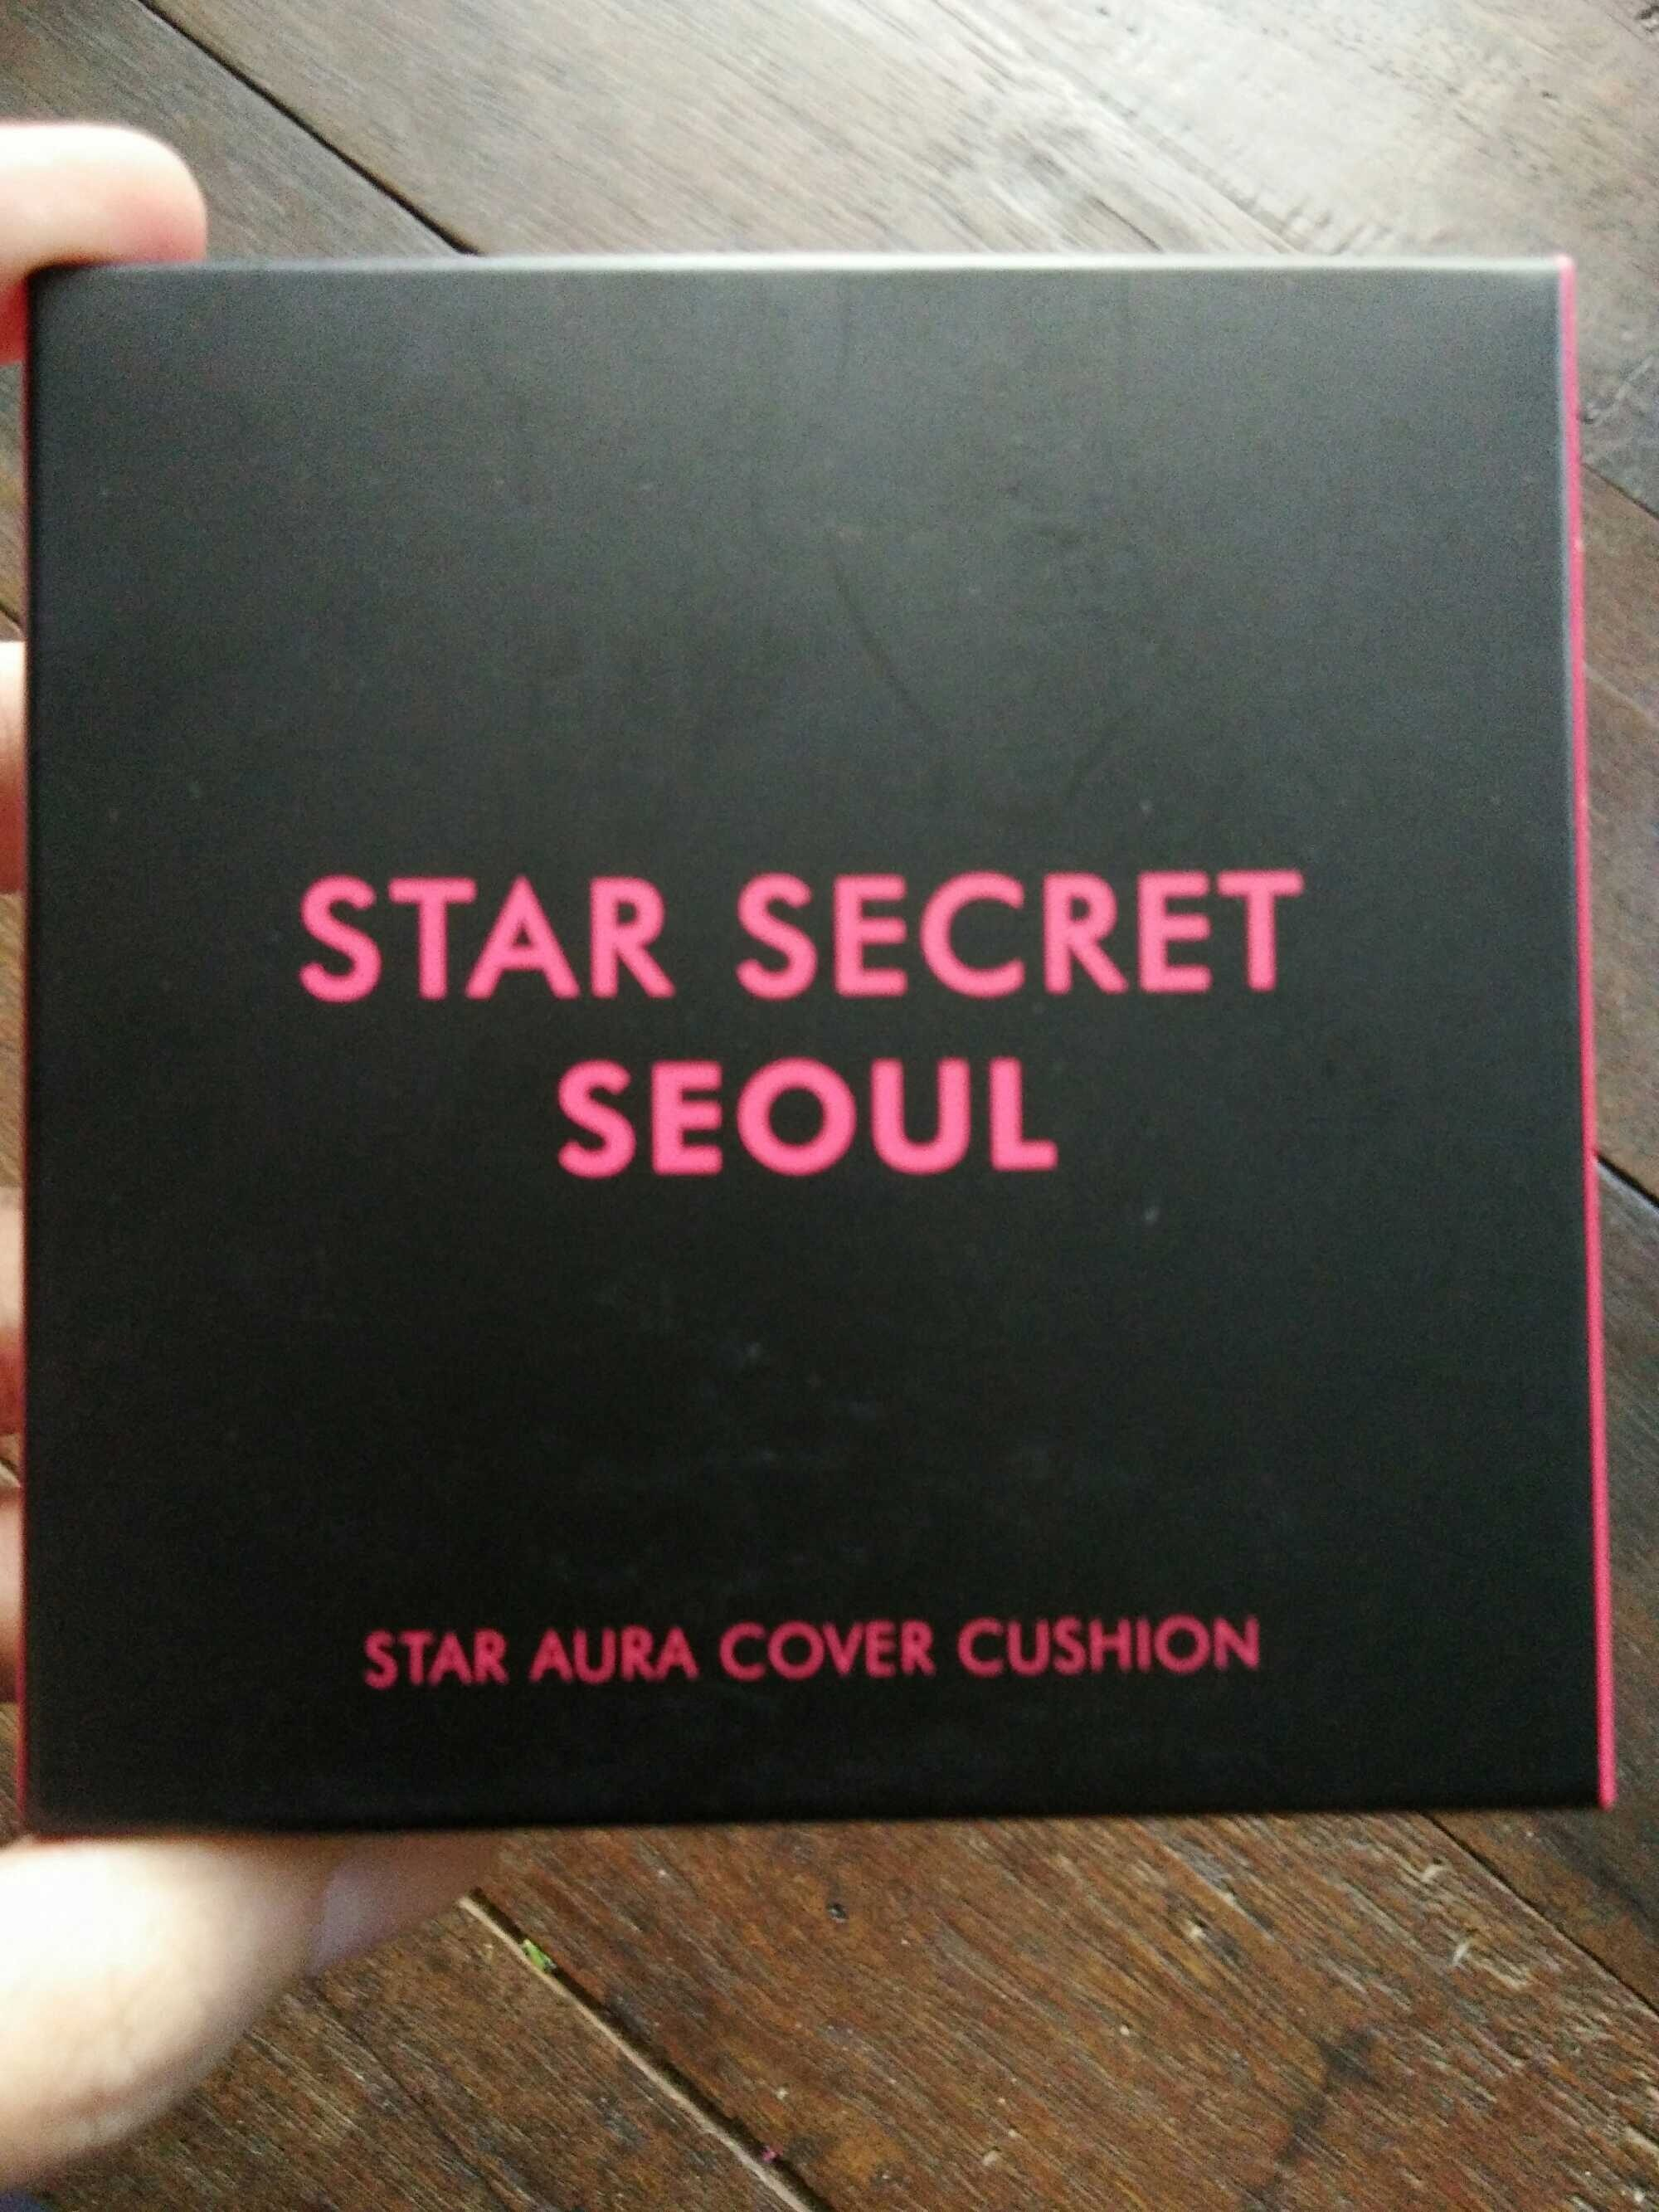 Star Aura Cover Cushion - Product - en